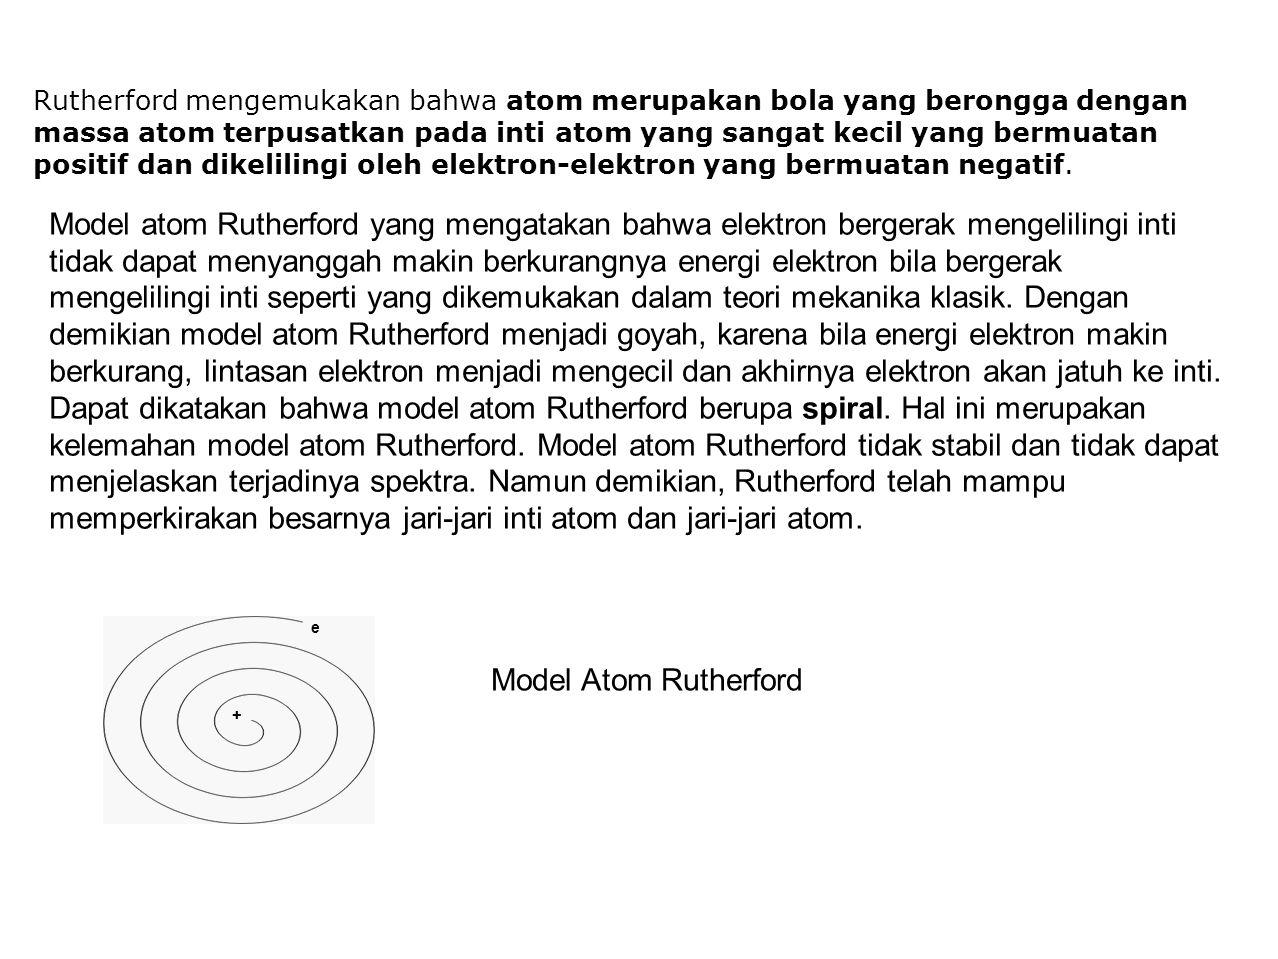 Rutherford mengemukakan bahwa atom merupakan bola yang berongga dengan massa atom terpusatkan pada inti atom yang sangat kecil yang bermuatan positif